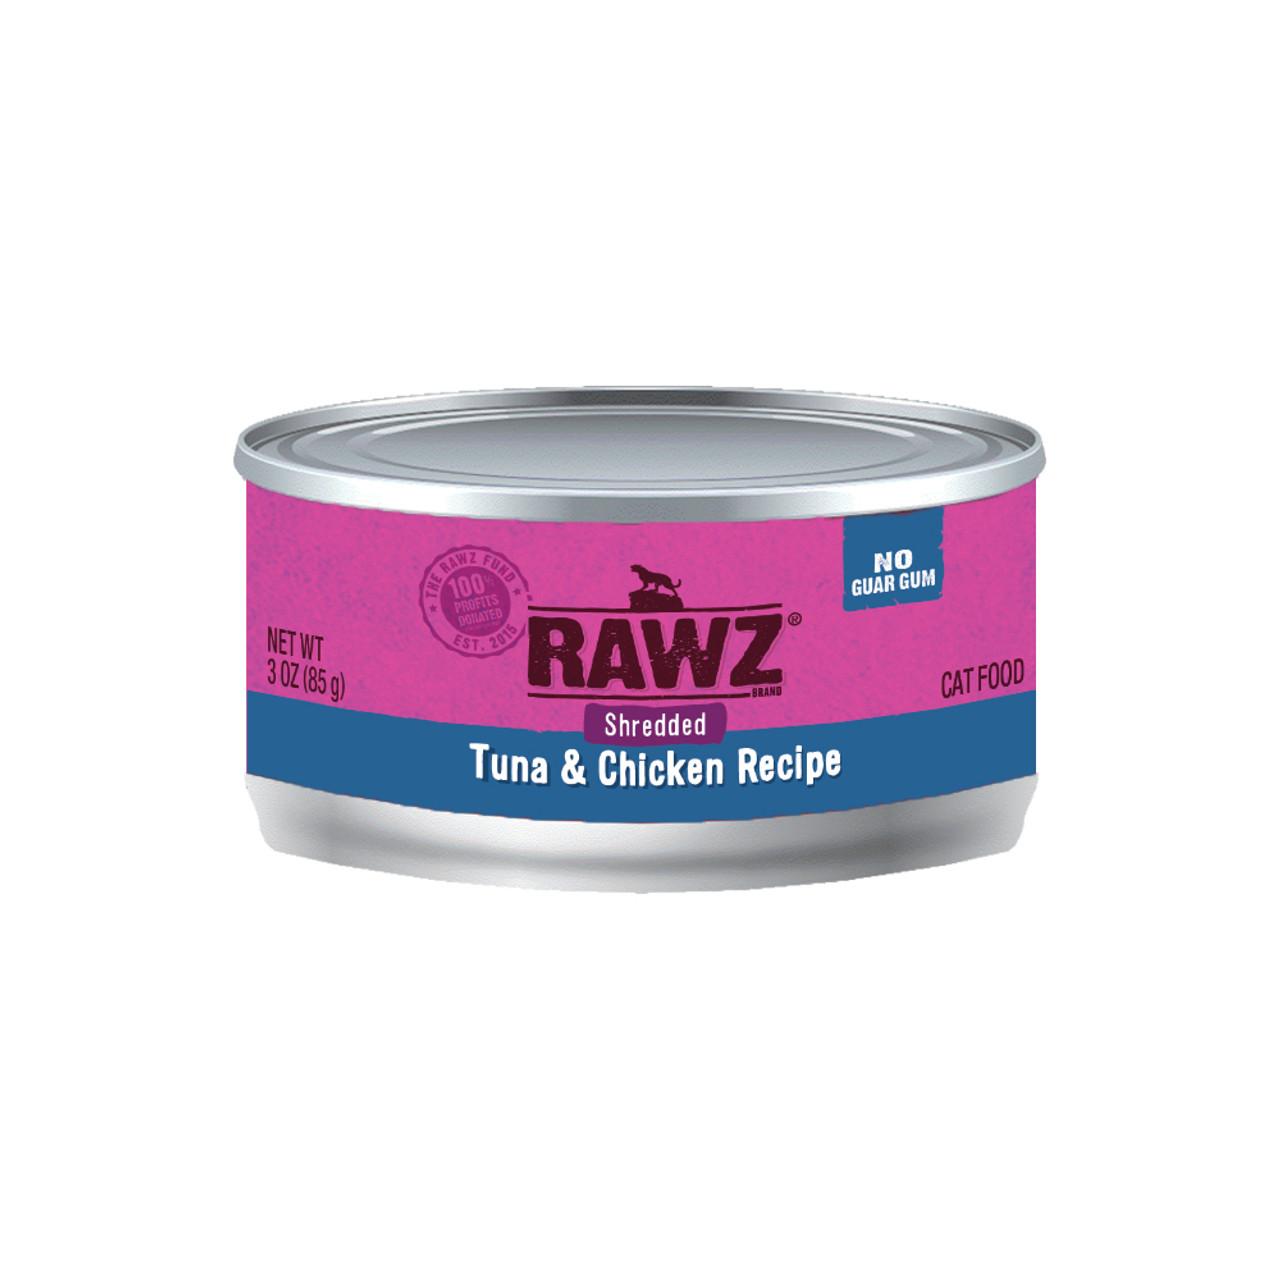 RAWZ Shredded Tuna & Chicken Recipe Adult Canned Cat Food